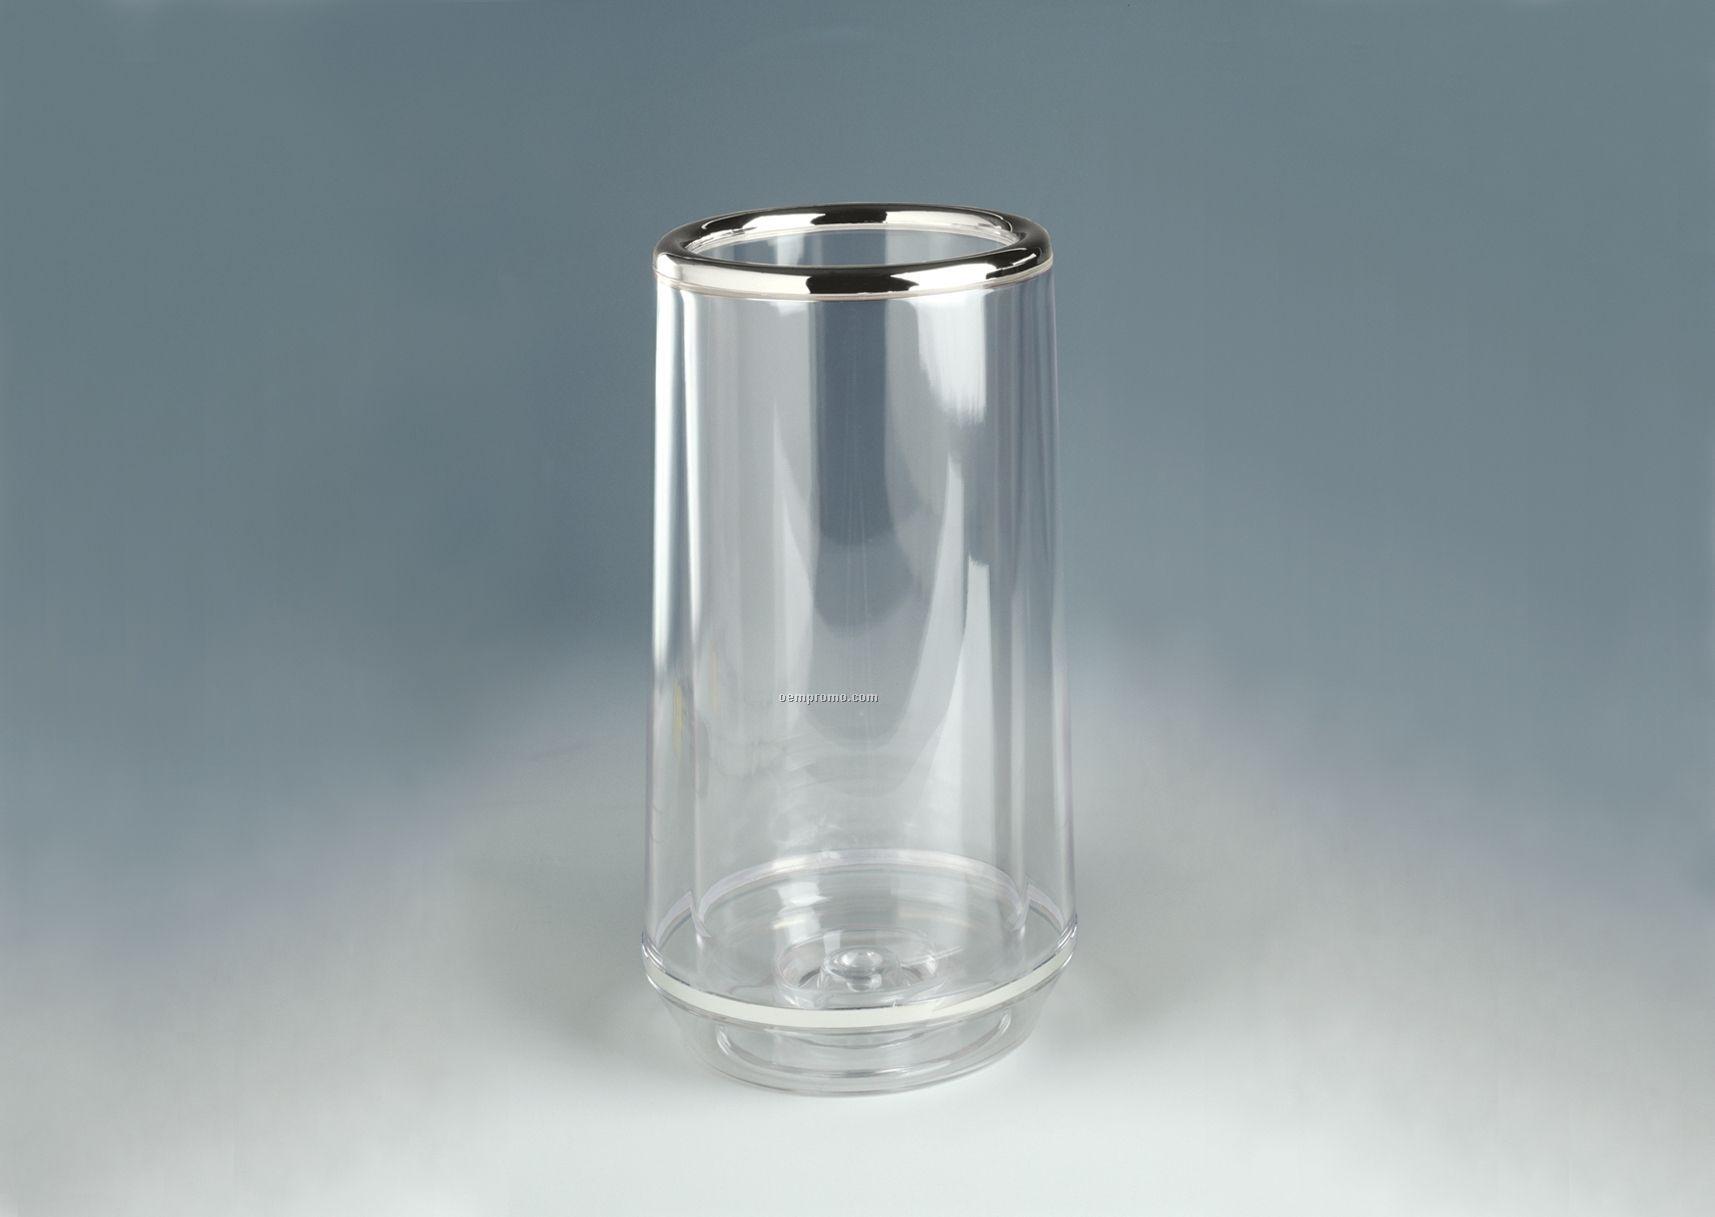 Chrome Trim Freddo Thermal Clear Wine Cooler